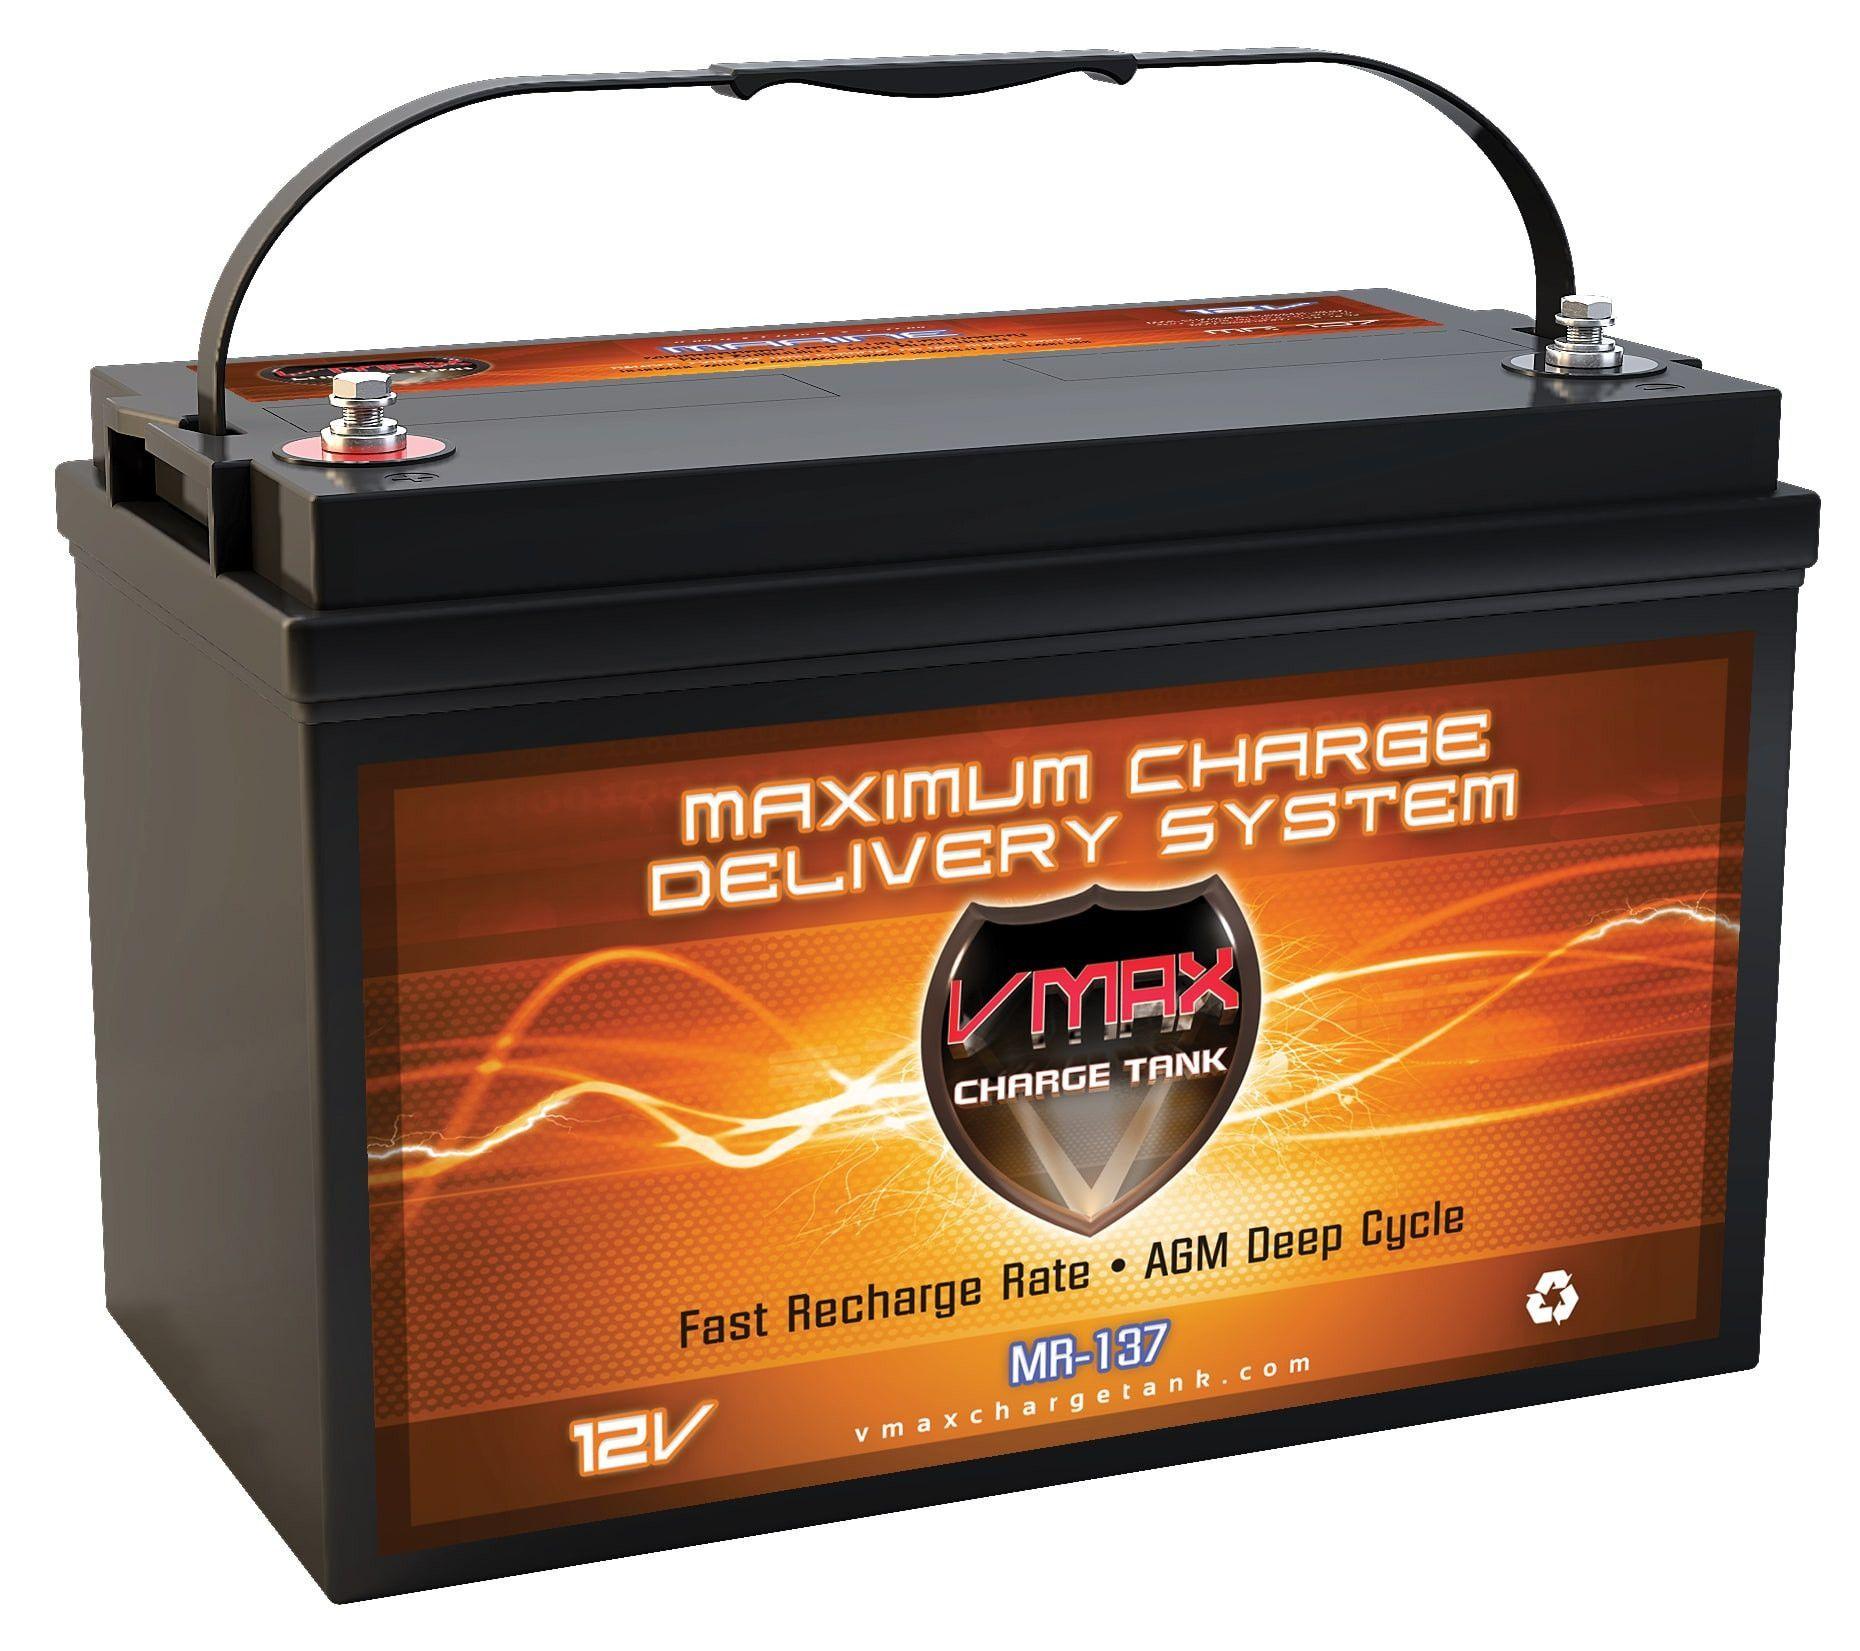 Mr137 120 Group 31 12v 120ah Agm Deep Cycle Battery 1596wh Solar Battery Rv Solar Power Deep Cycle Battery